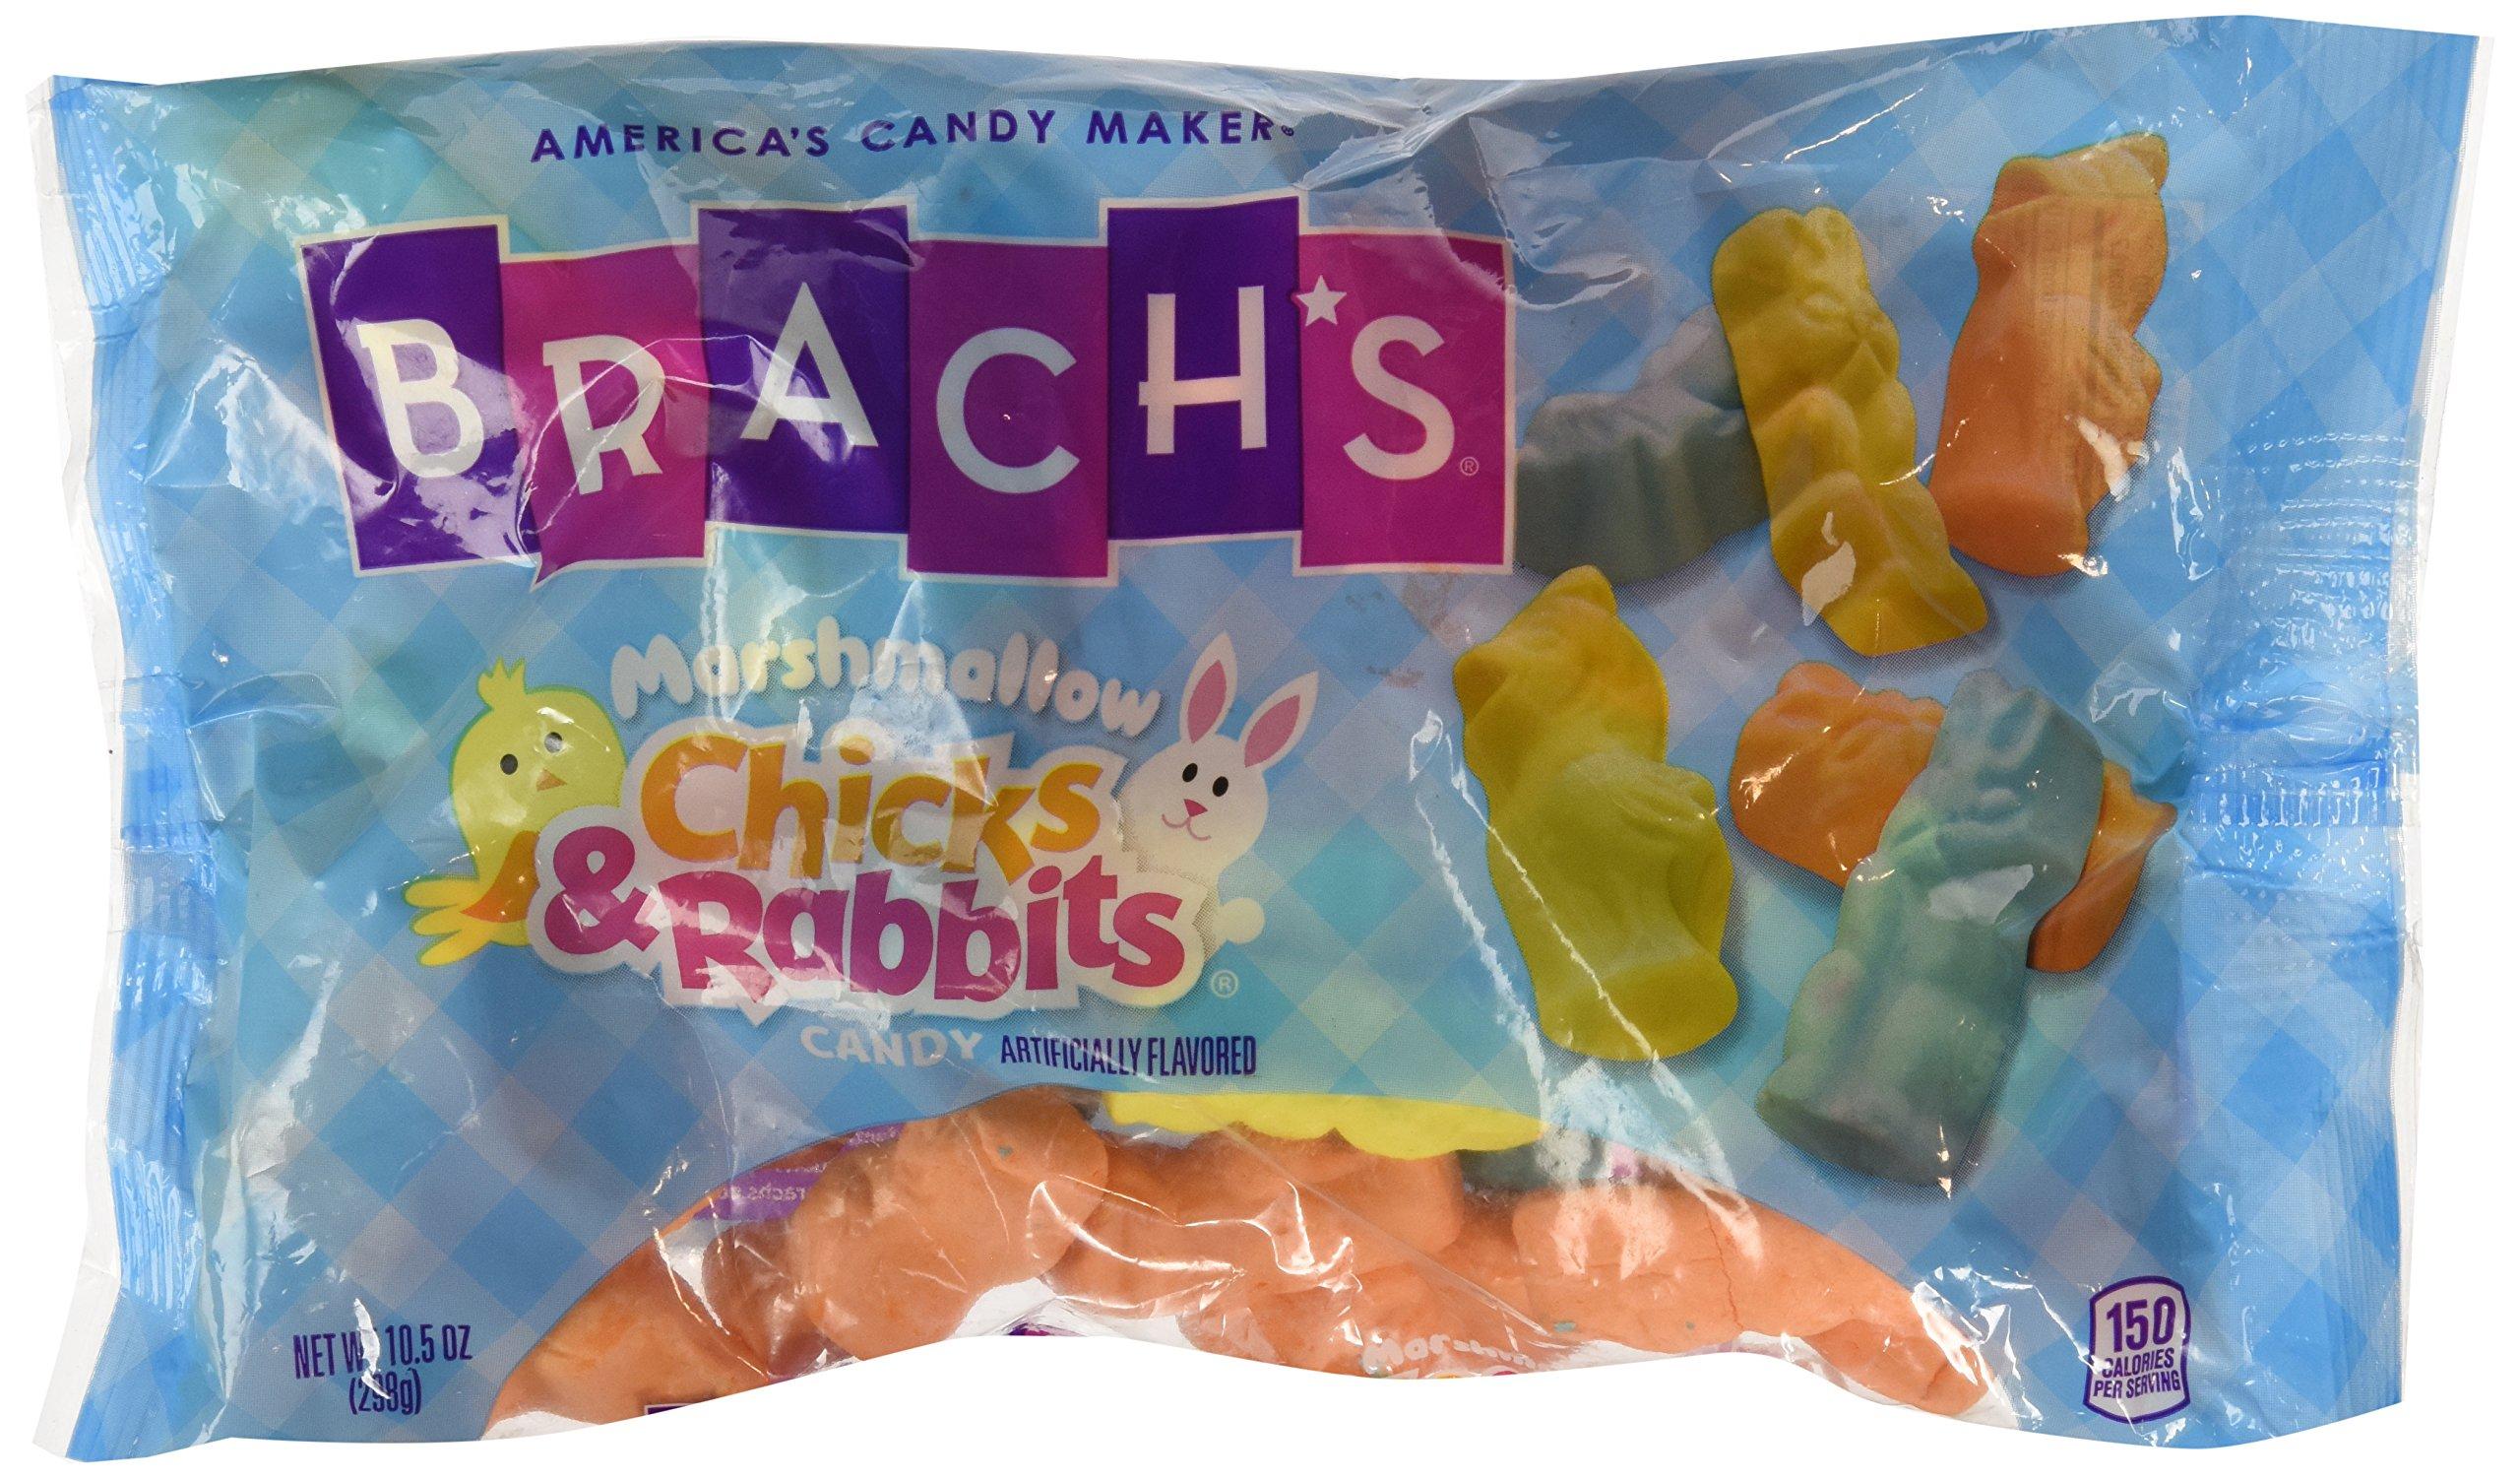 Brach's Chicks & Rabbits Marshmallows 10.5oz.